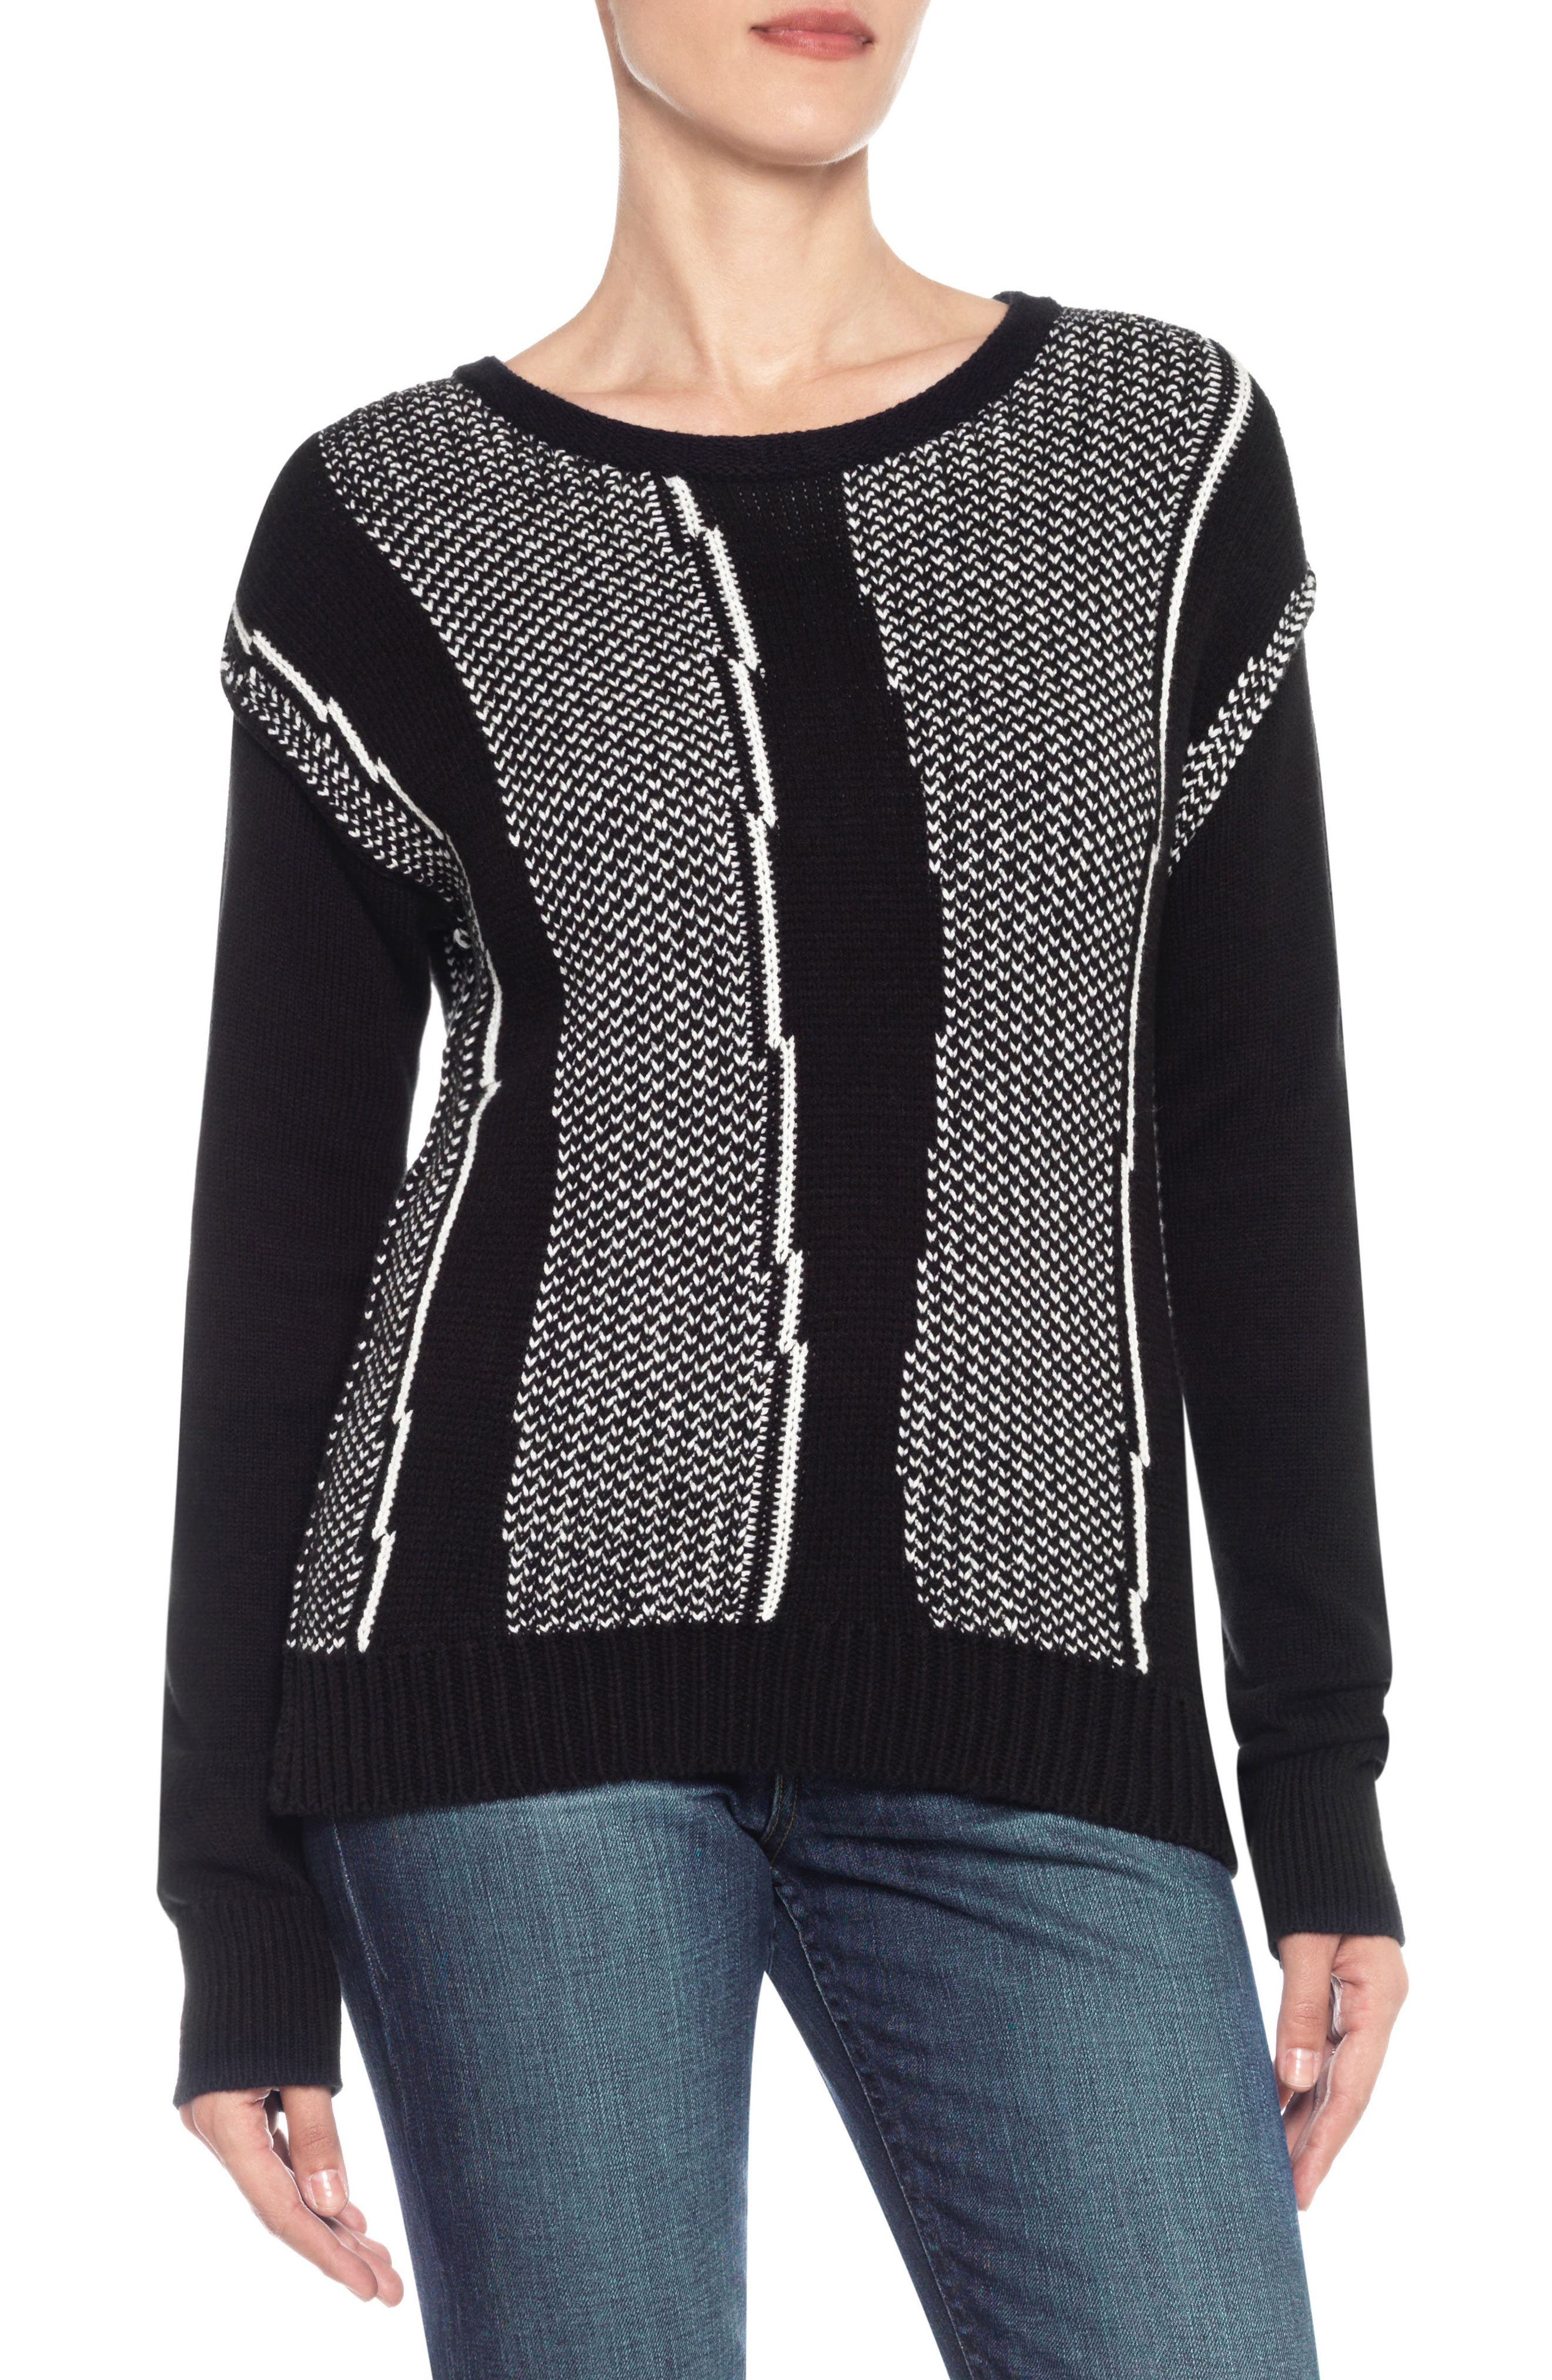 Keegan Sweater,                         Main,                         color, Black/ White